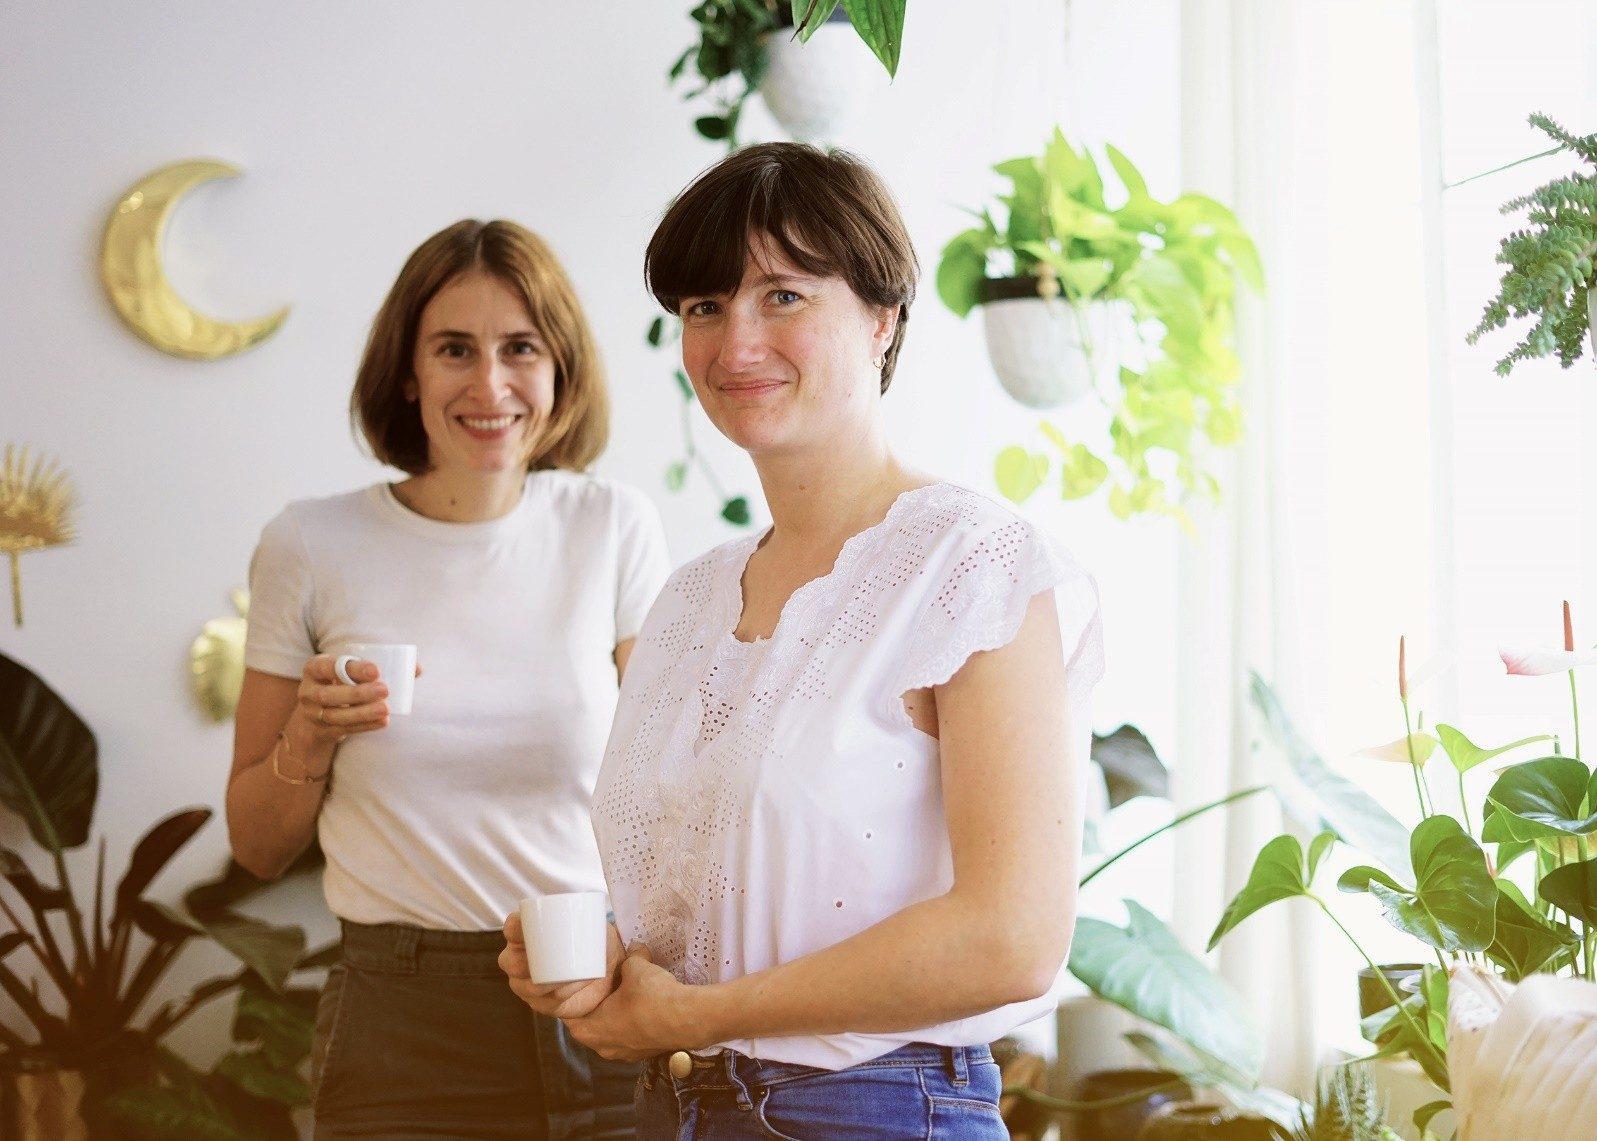 Muse & Marlowe - Aline Gibson et Lucie Flochay